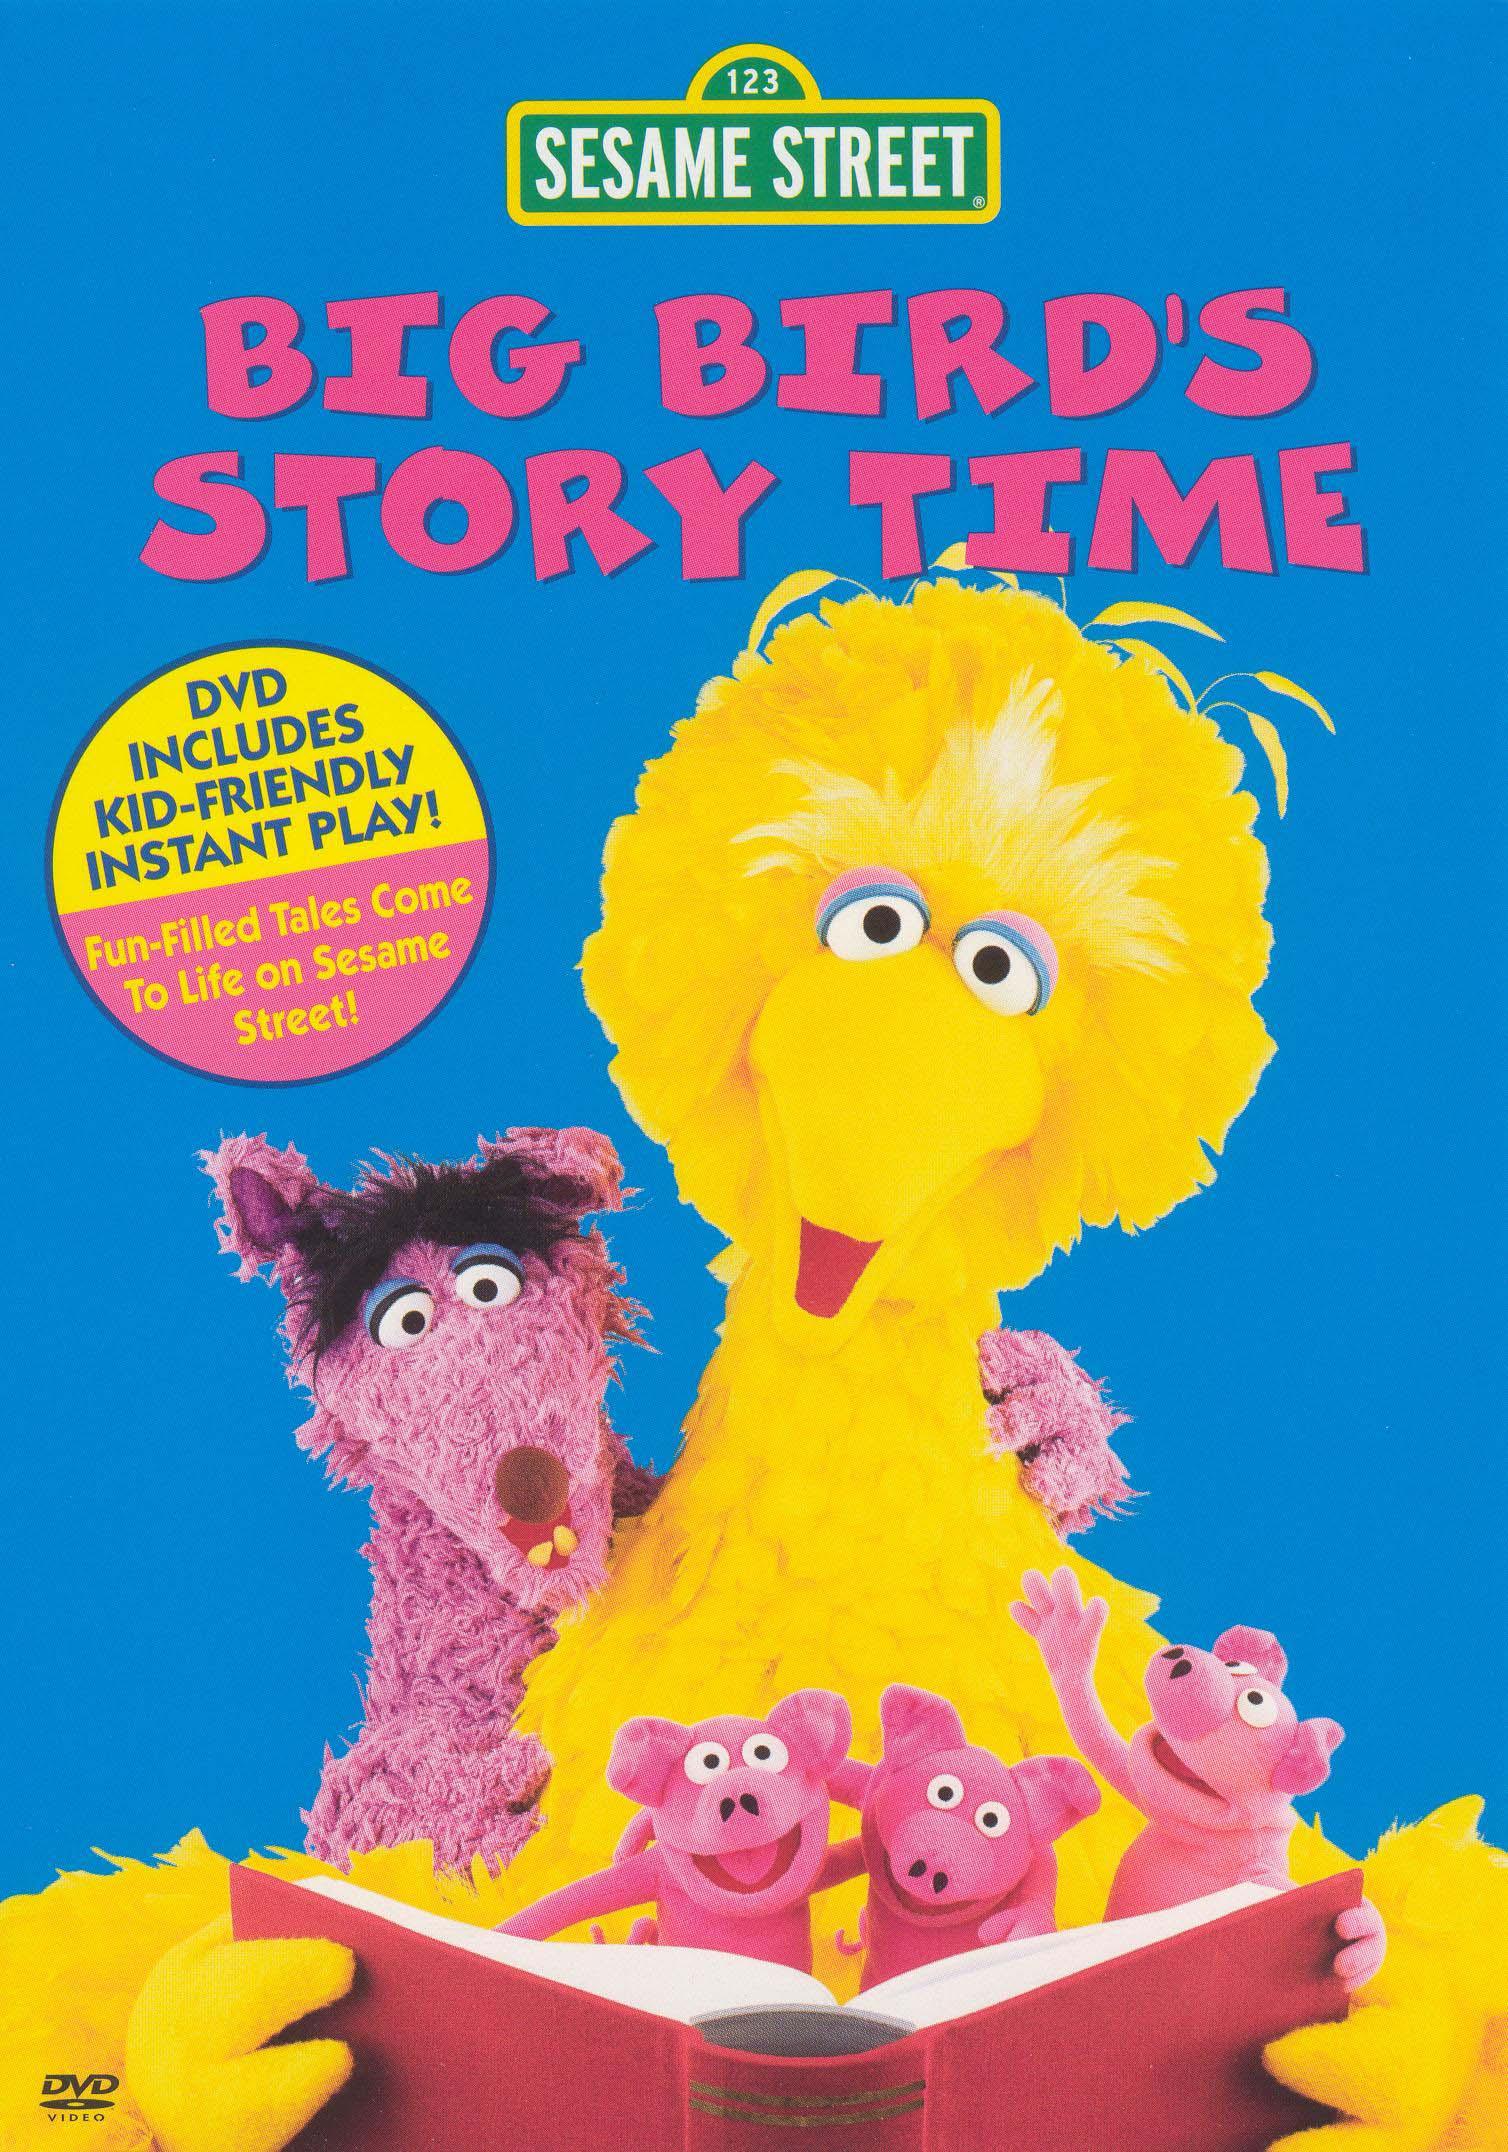 Sesame Street: Big Bird's Story Time